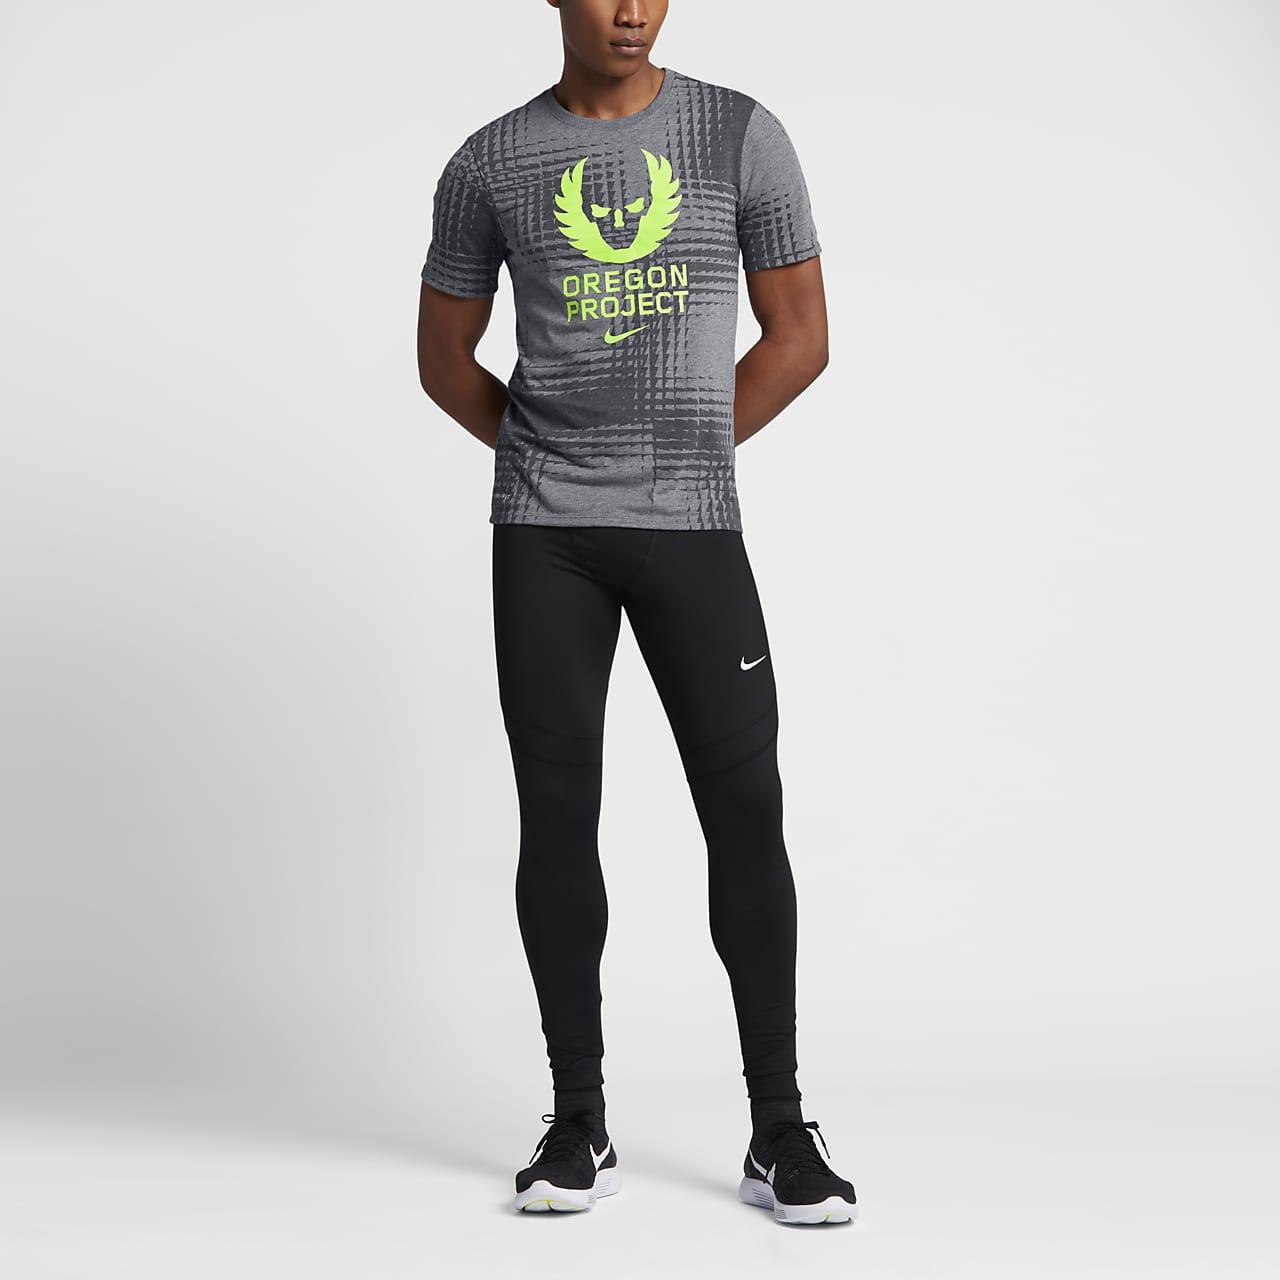 Rubicundo logo Continuar  Nike Dry 'Oregon Project' Men's Running T-Shirt. Nike NZ